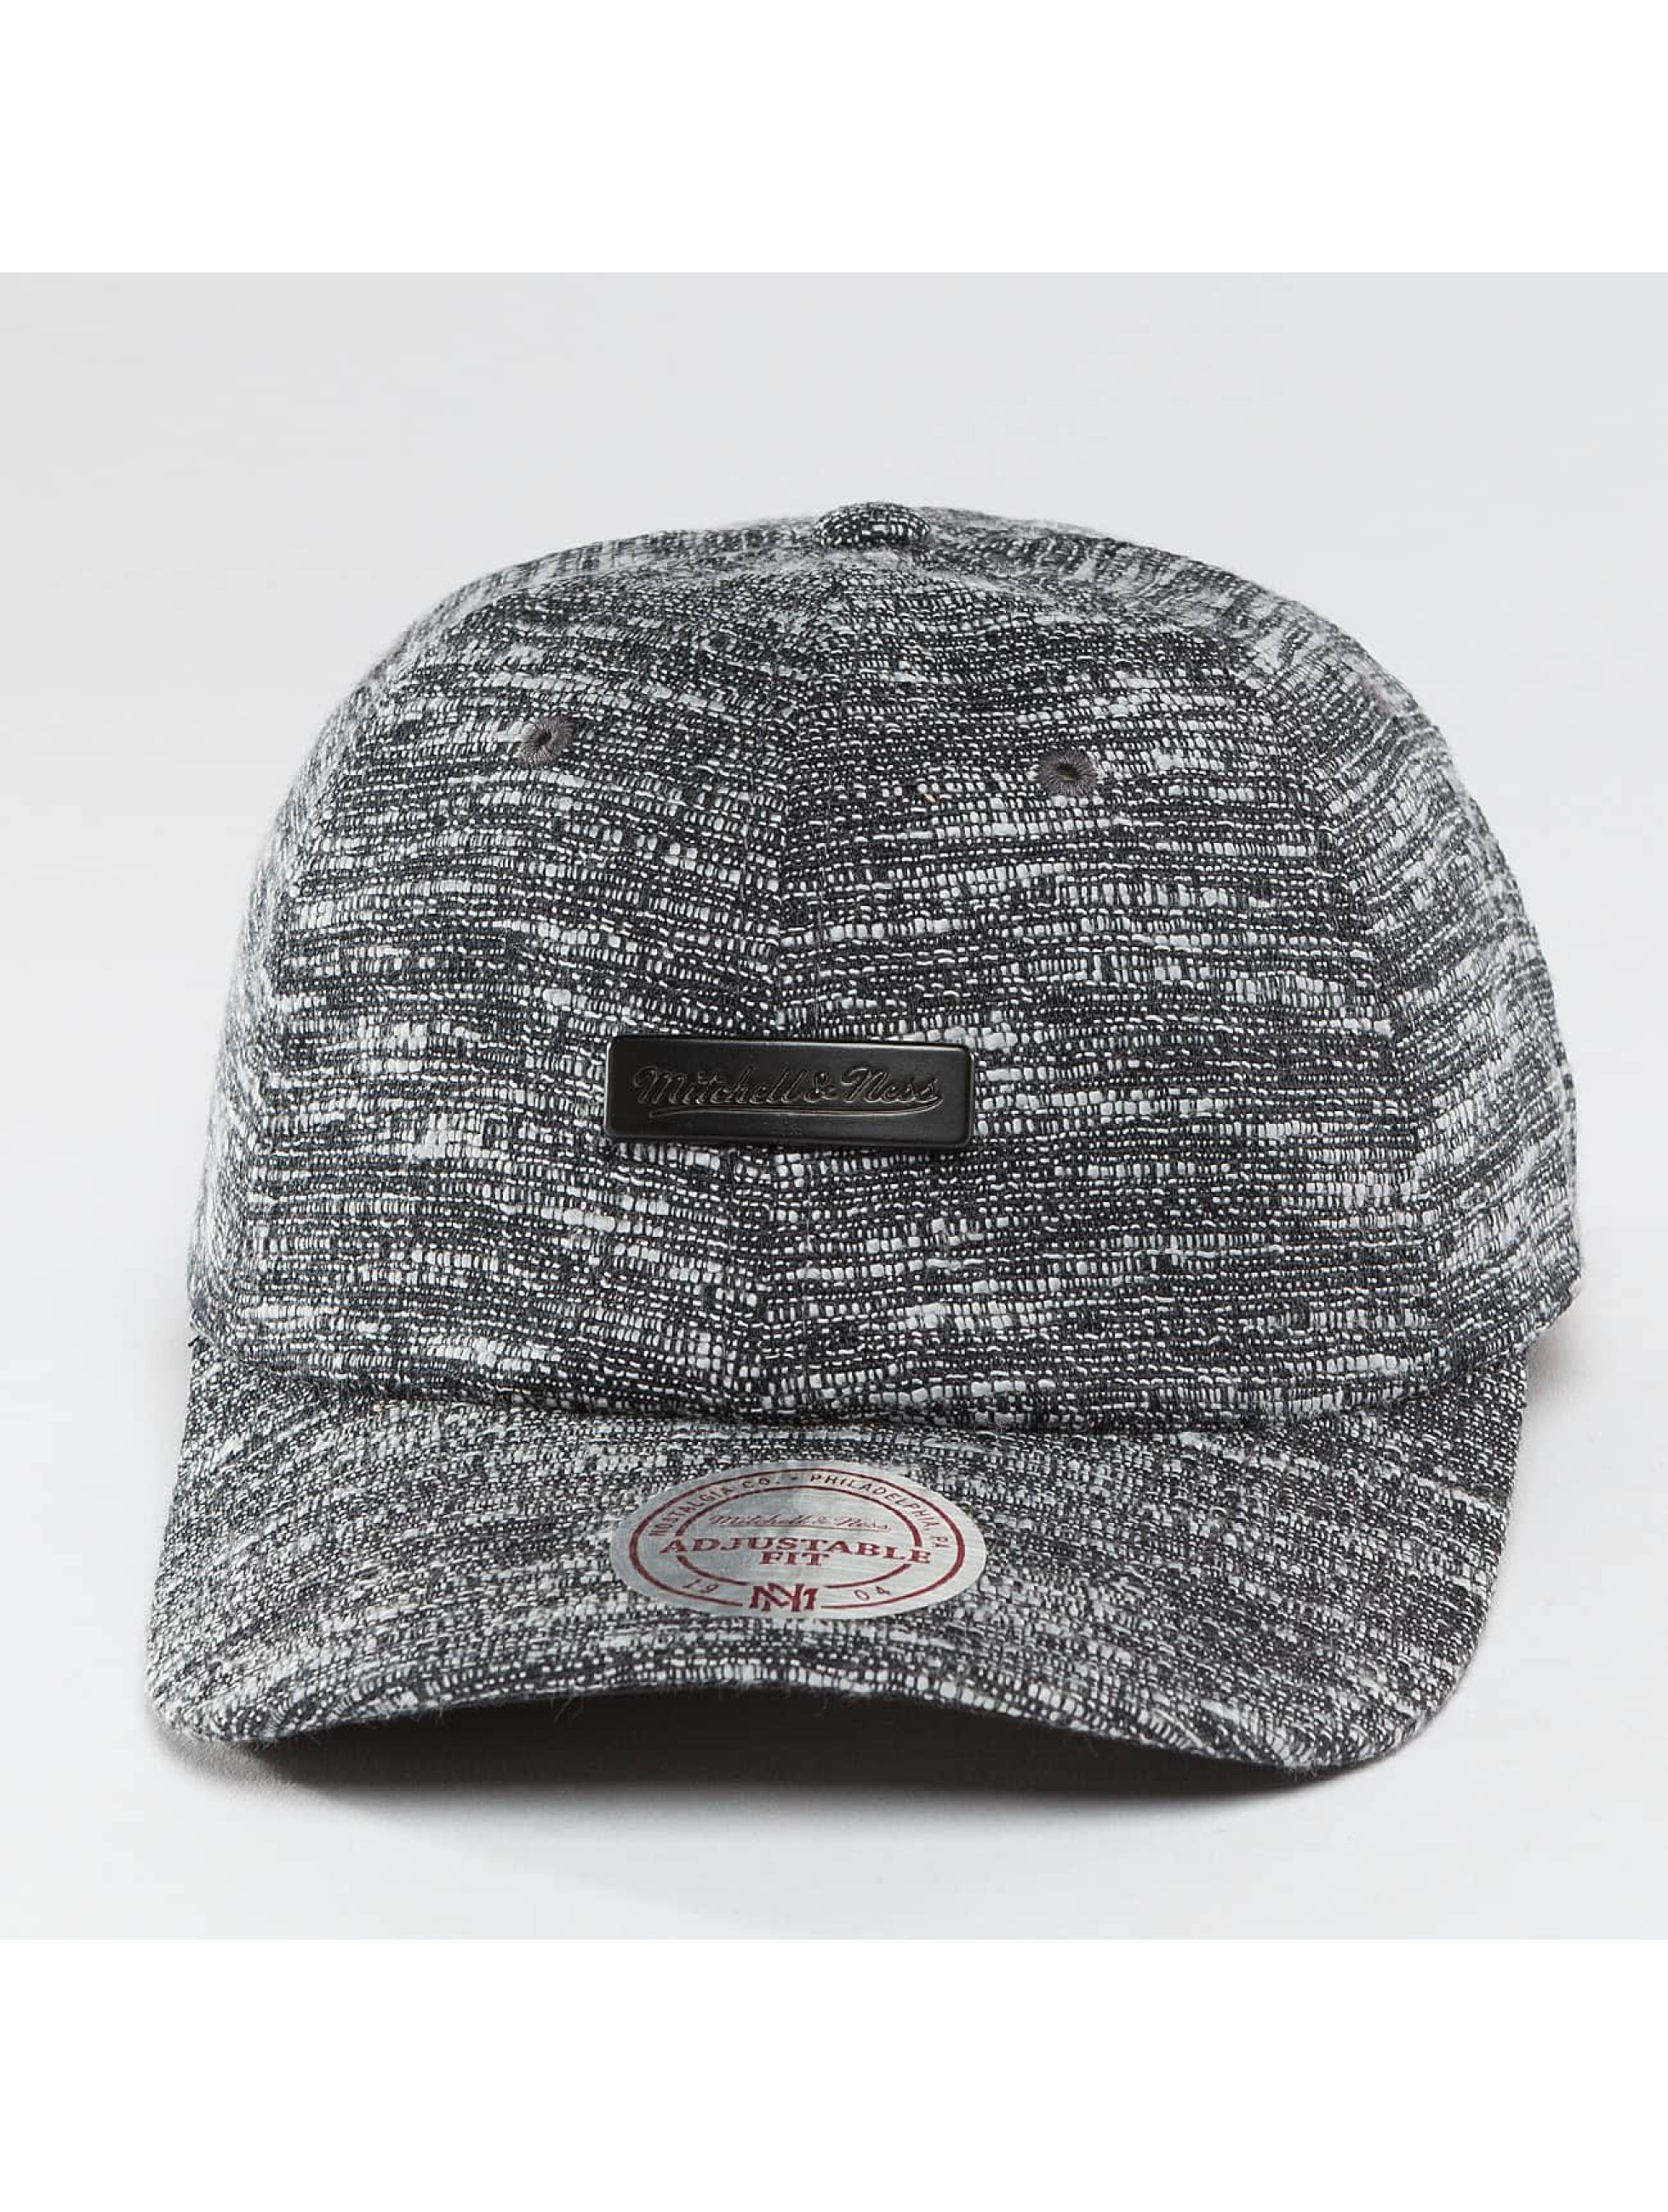 Mitchell & Ness Boost Strapback Cap Black/White Sale Angebote Döbern